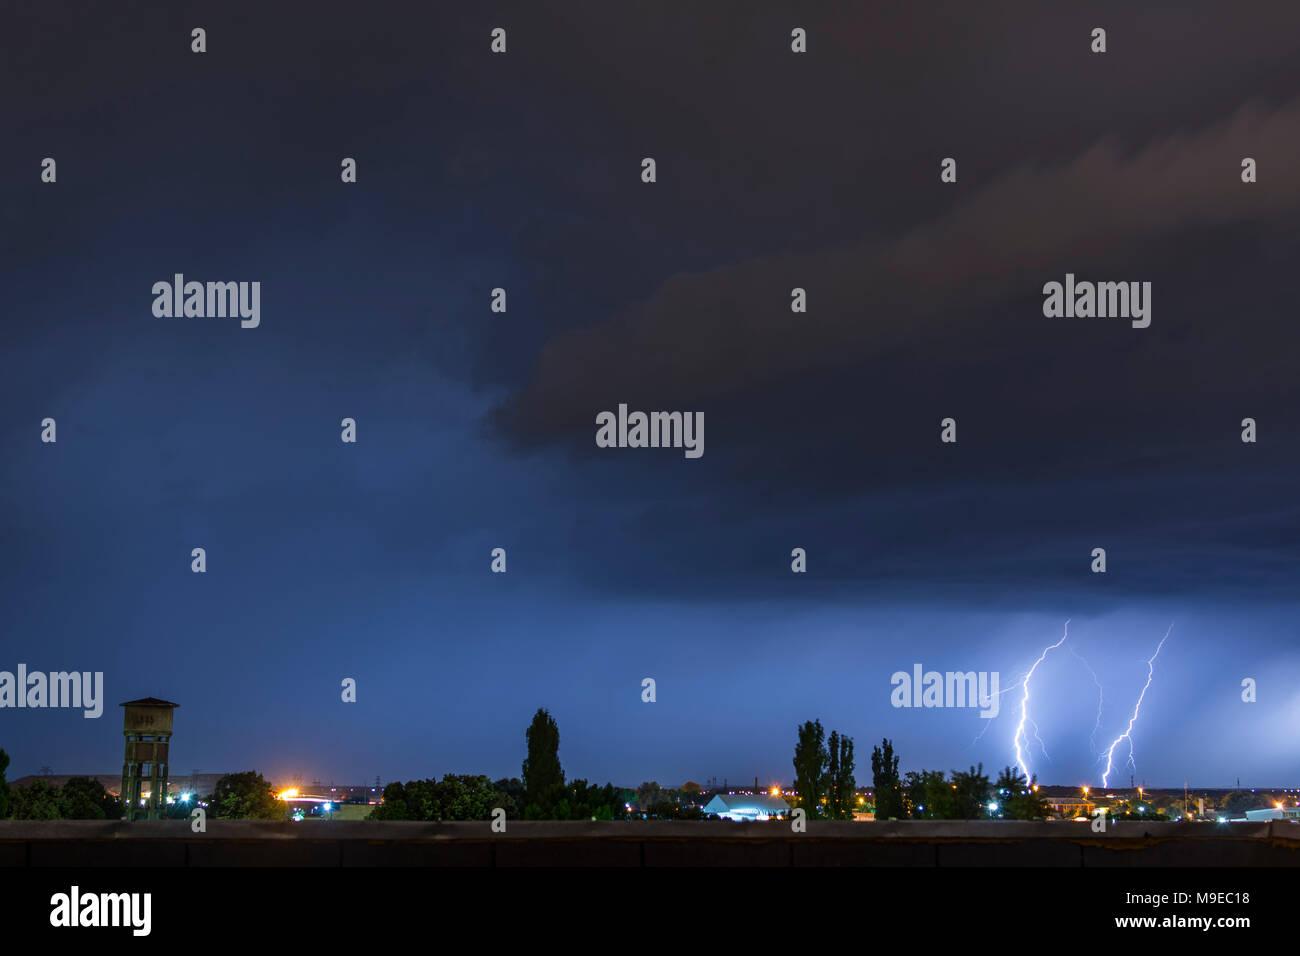 Lightning flash over a city, Thunderstorm , electricity blast storm, thunderbolt in sky - Stock Image